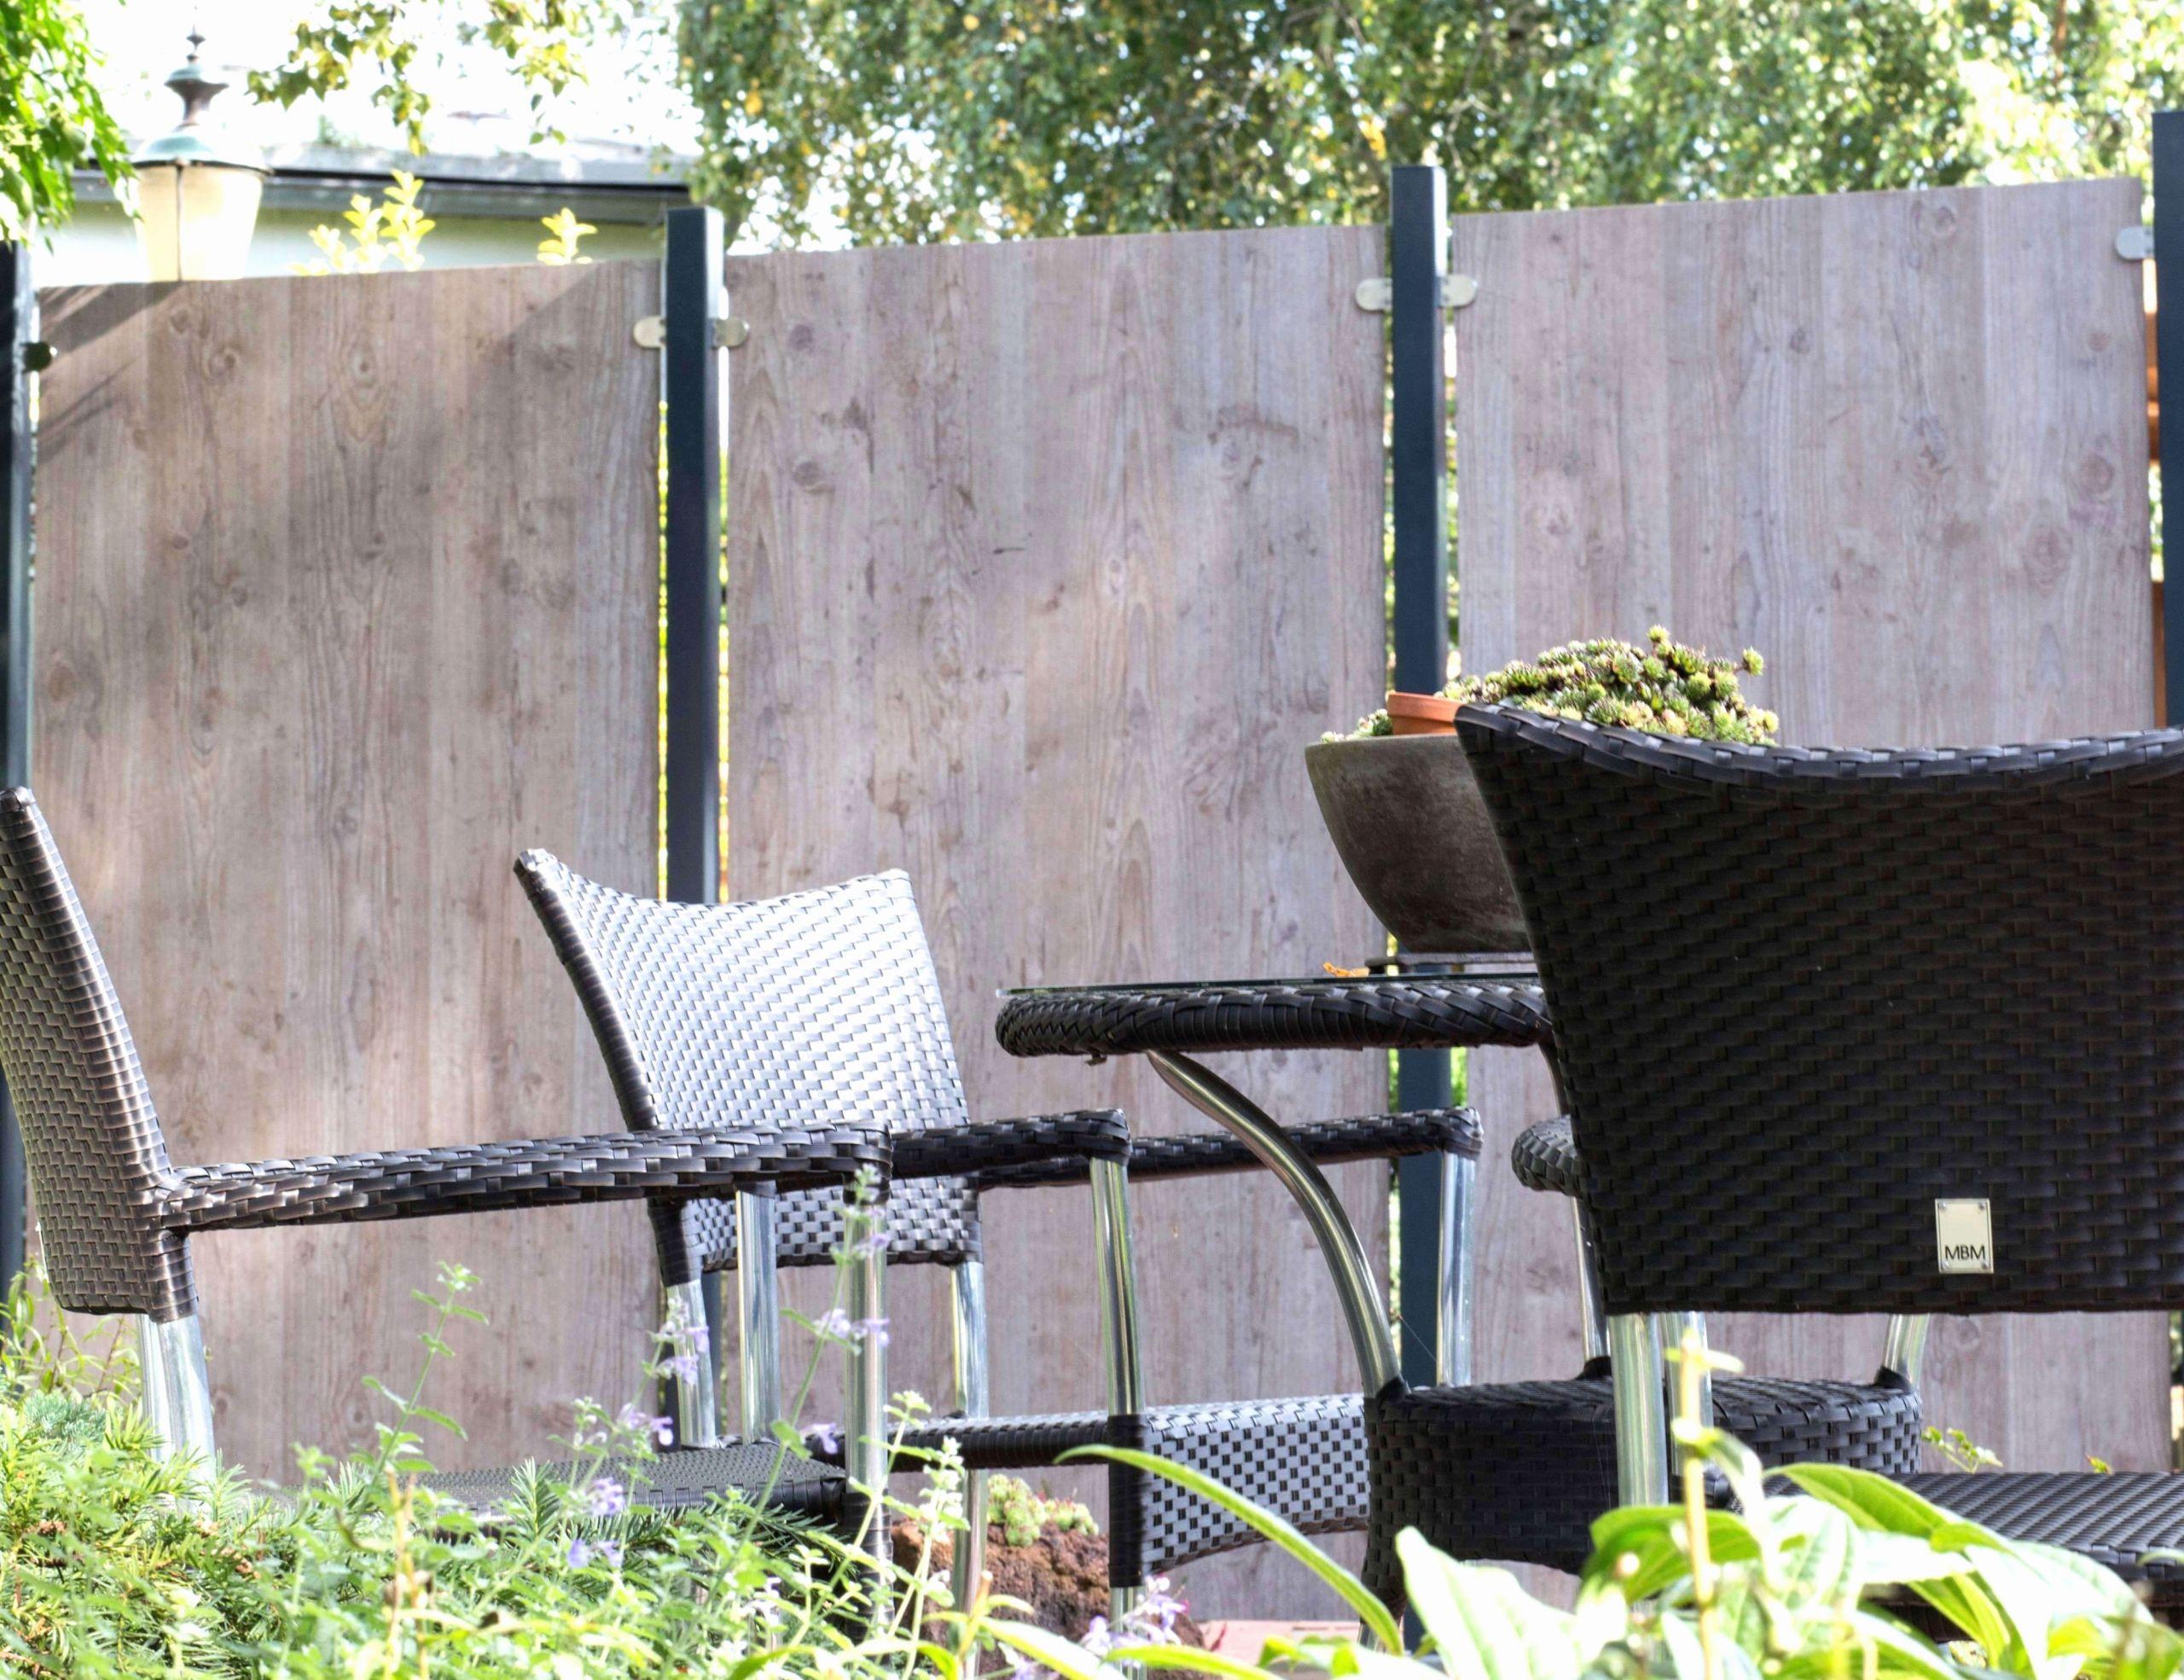 Beetgestaltung Modern Best Of Garden Oasis Beautiful Outdoor Bar Storage Cabinet with